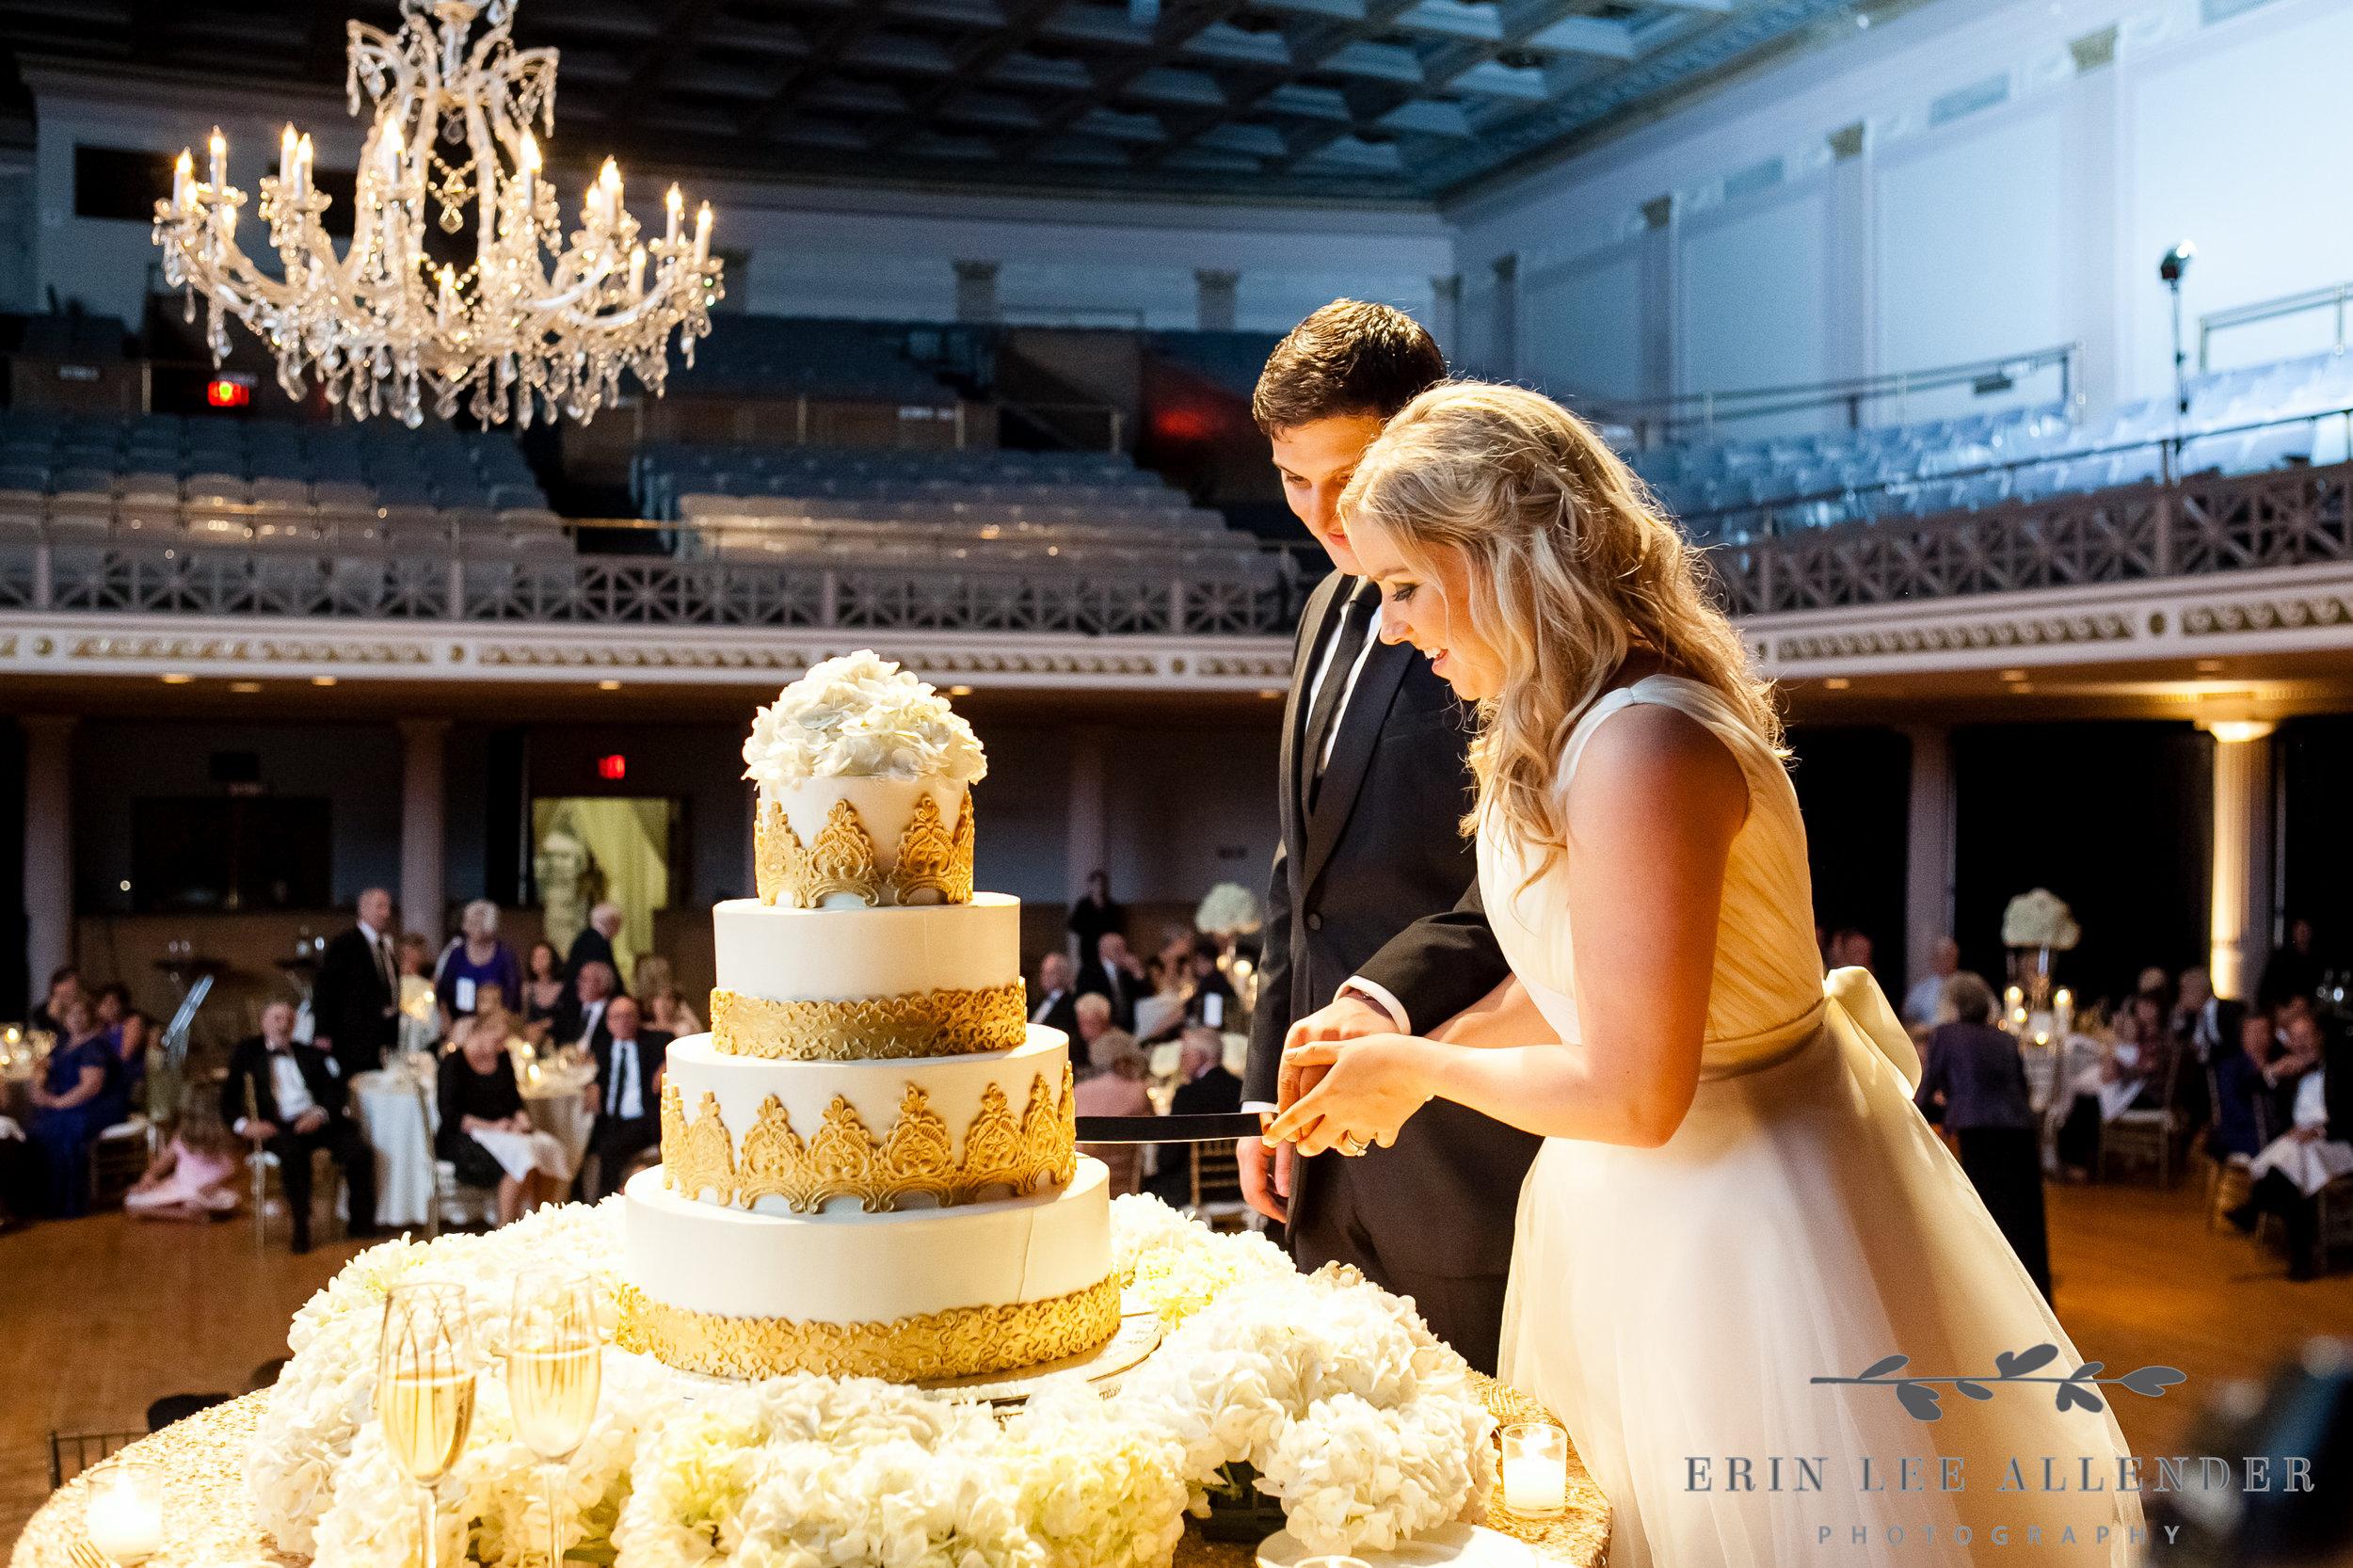 Bride_Groom_Cut _The_Cake